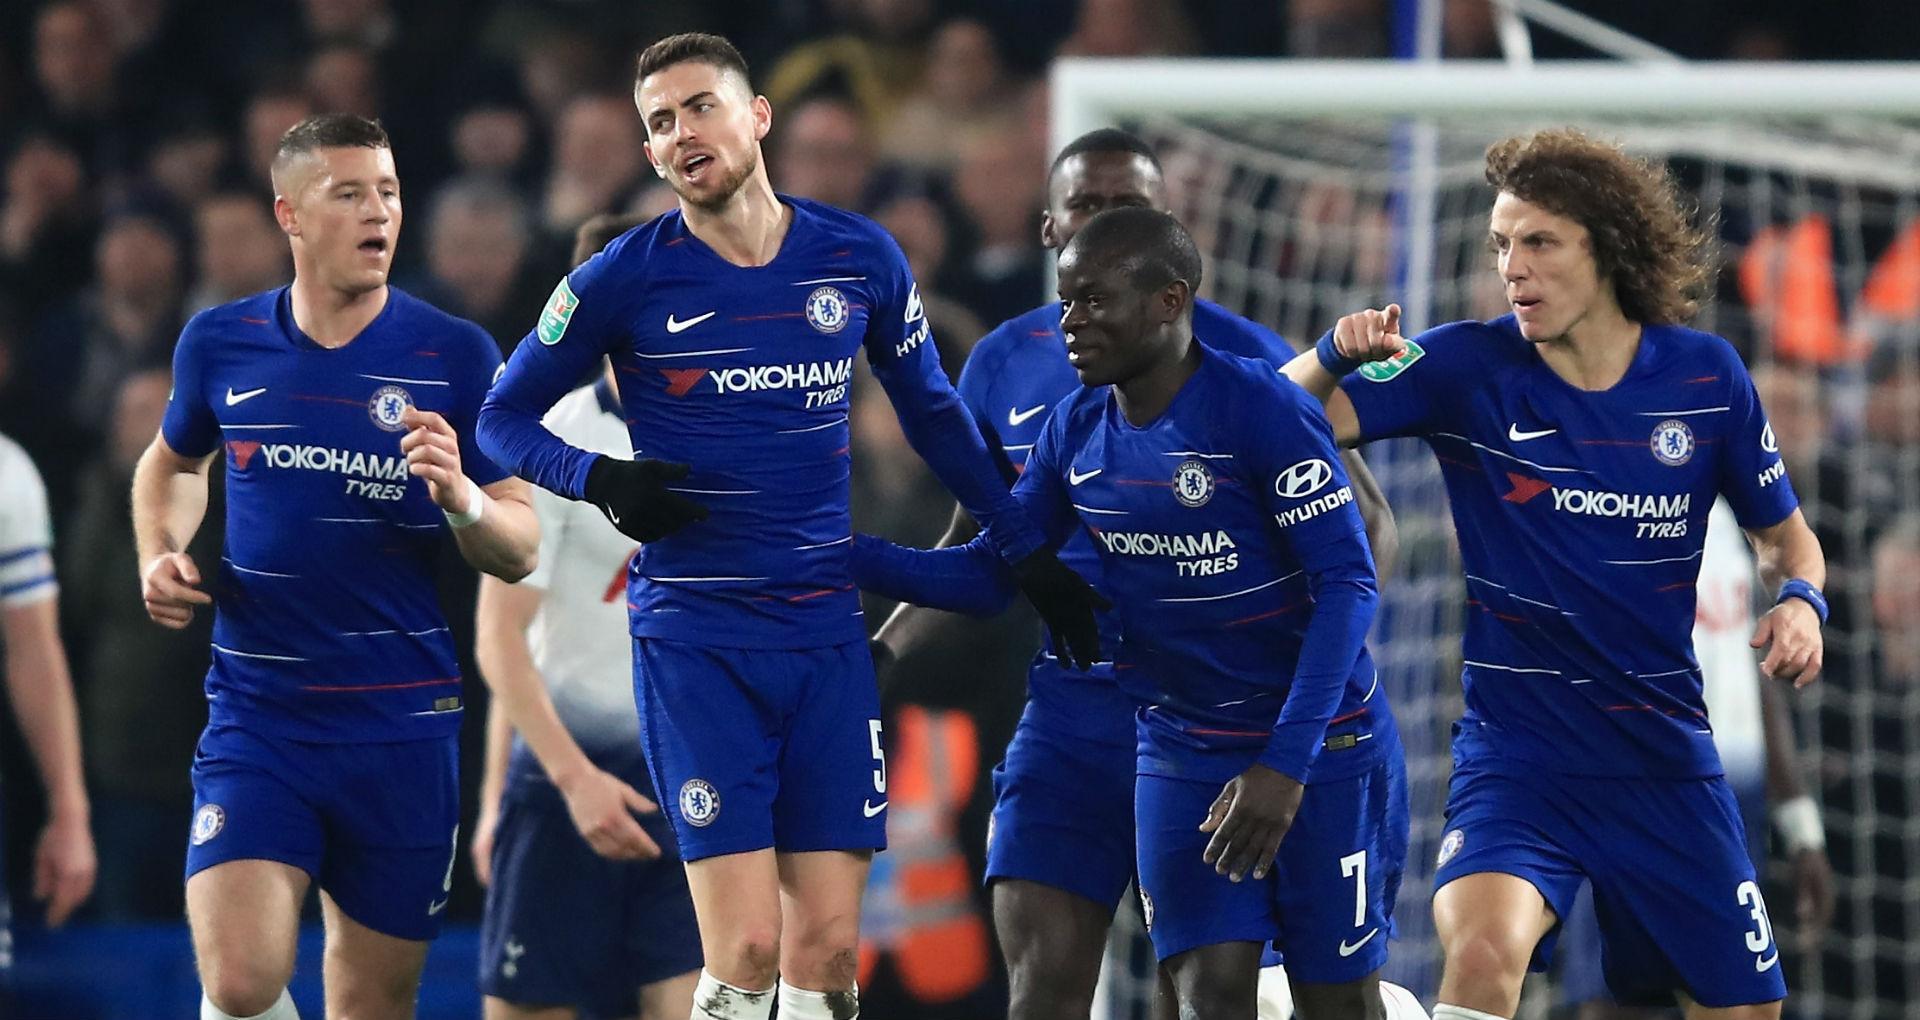 Ross Barkley Jorginho N'Golo Kante David Luiz Chelsea 2018-19